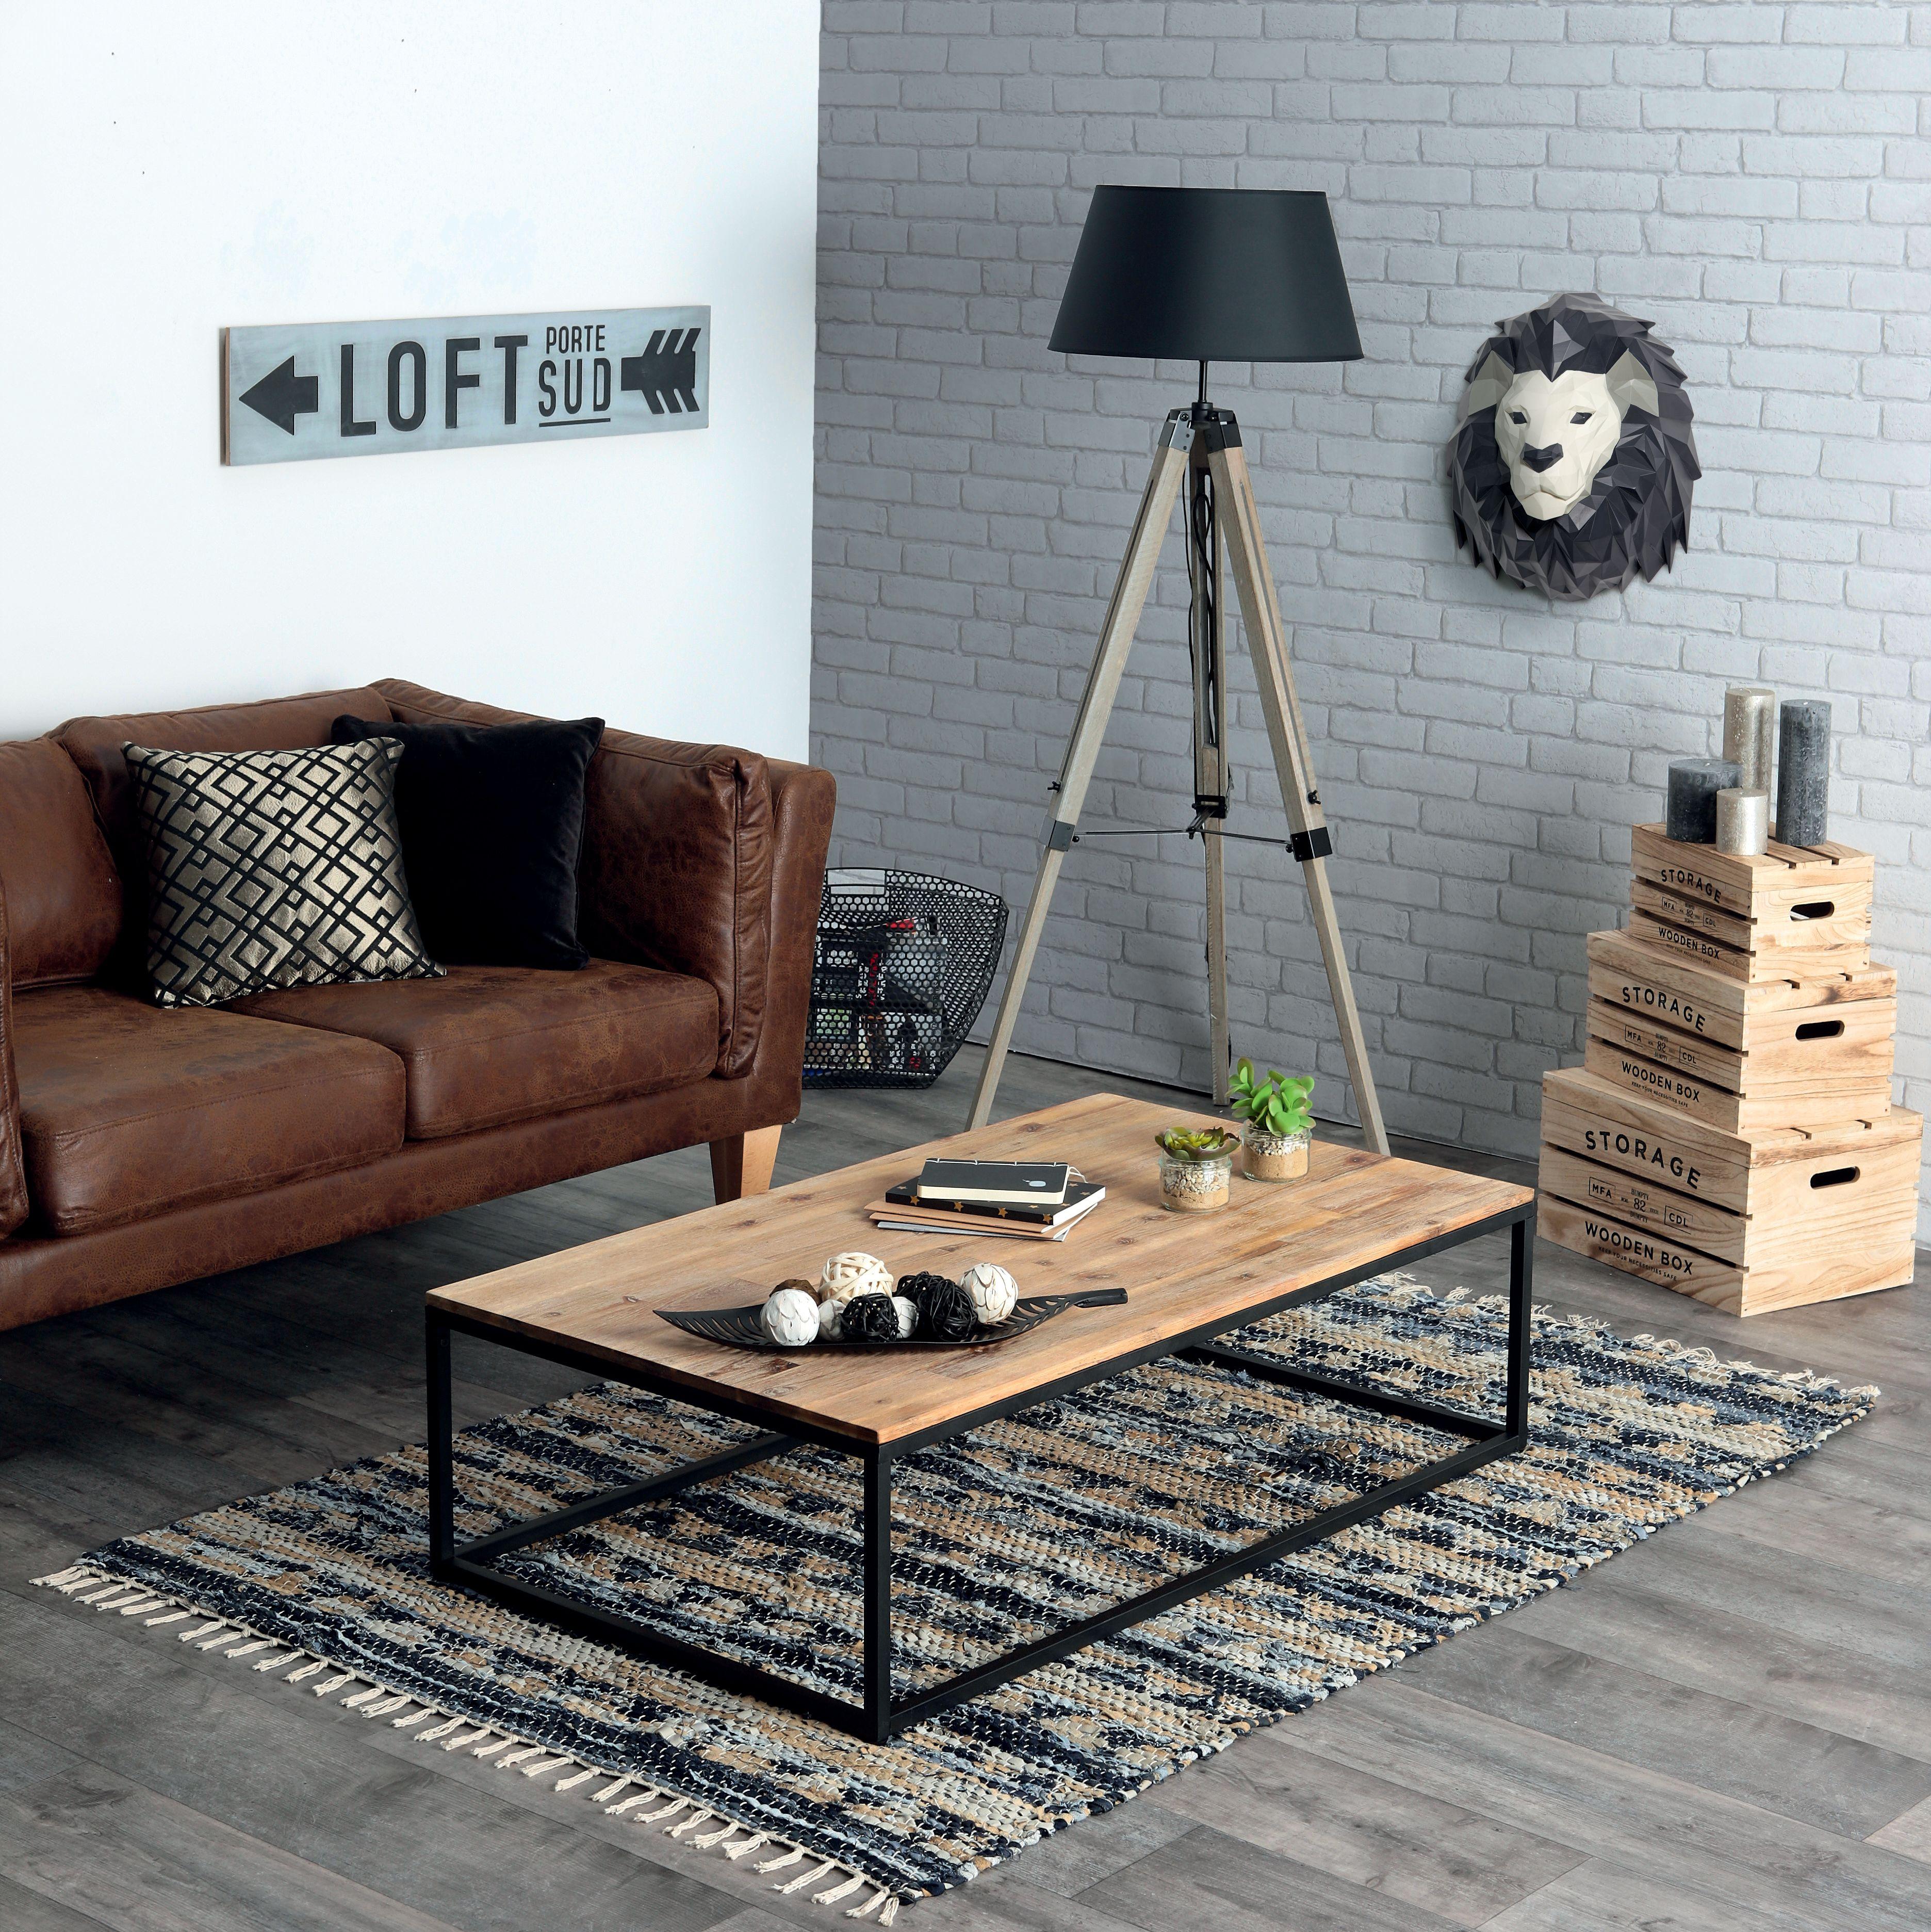 Mon salon Mon style industriel Pinterest